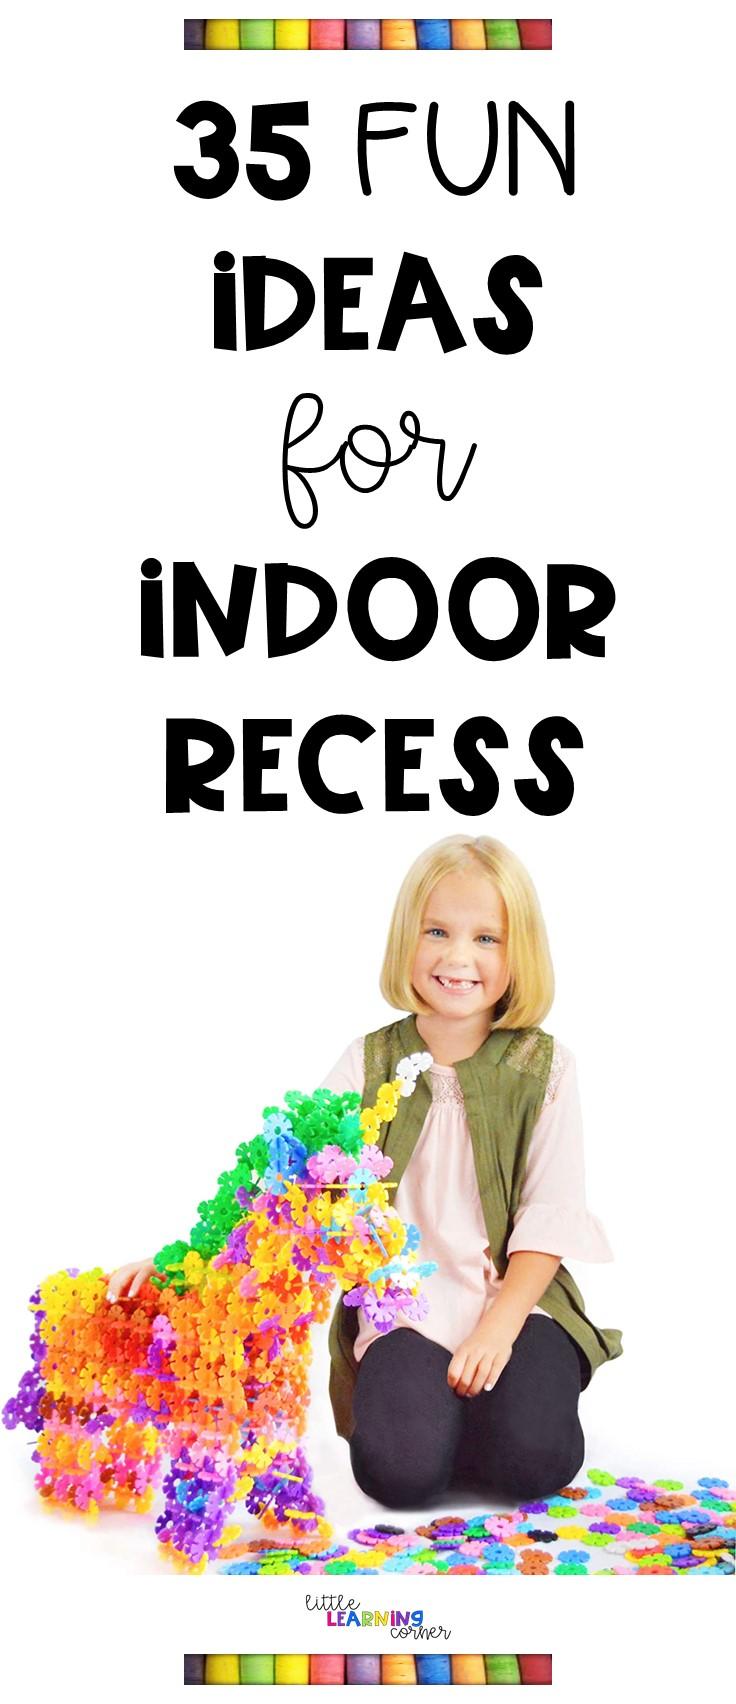 indoor-recess-pin